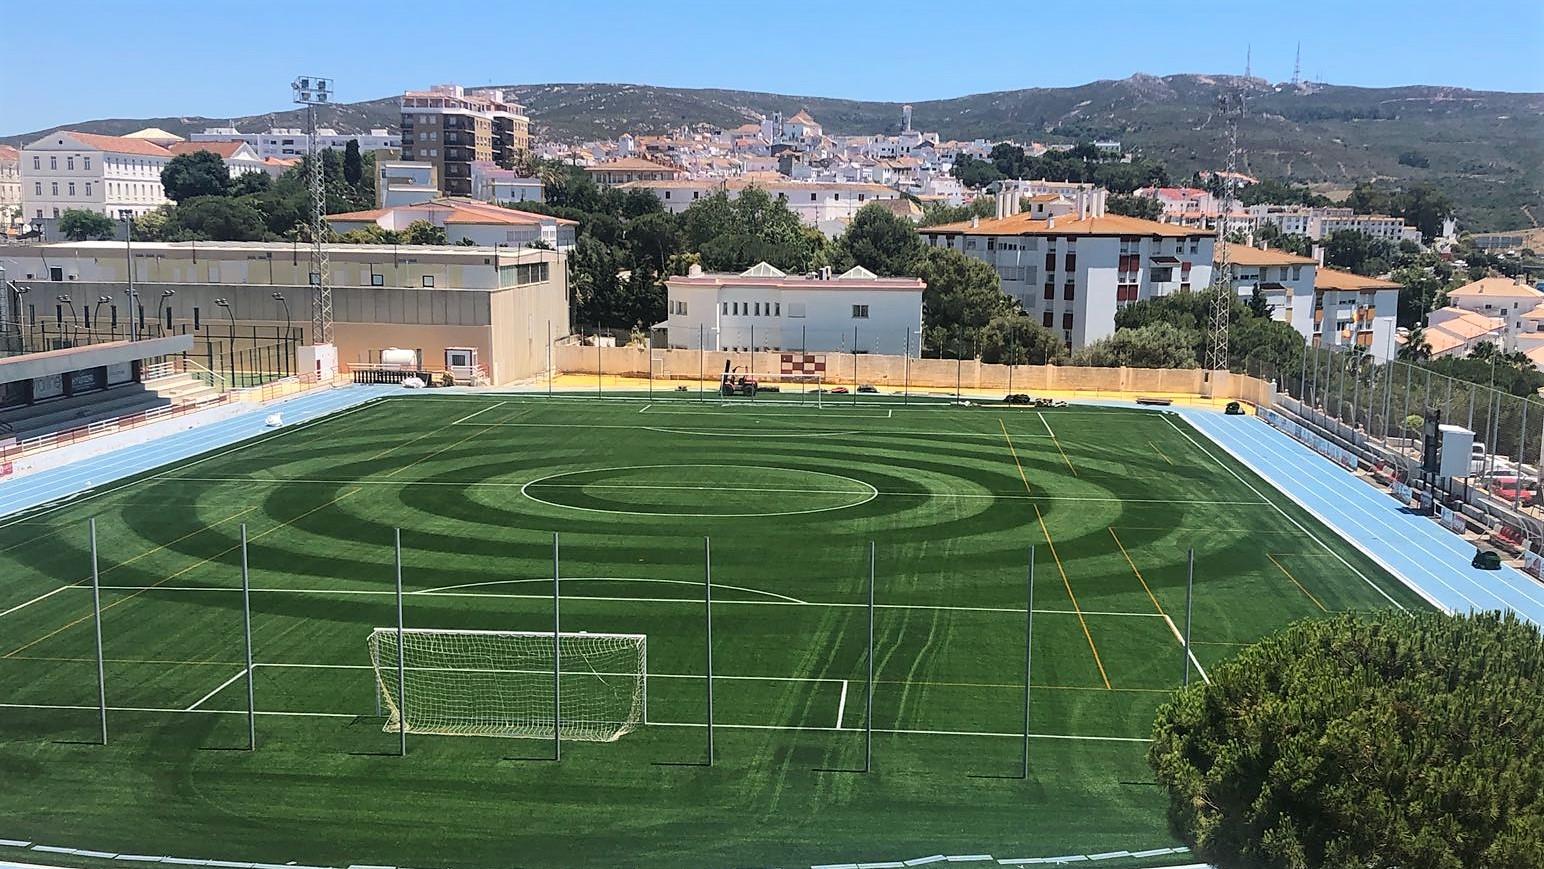 Campo de Fútbol Manolo Mesa, Cádiz Image